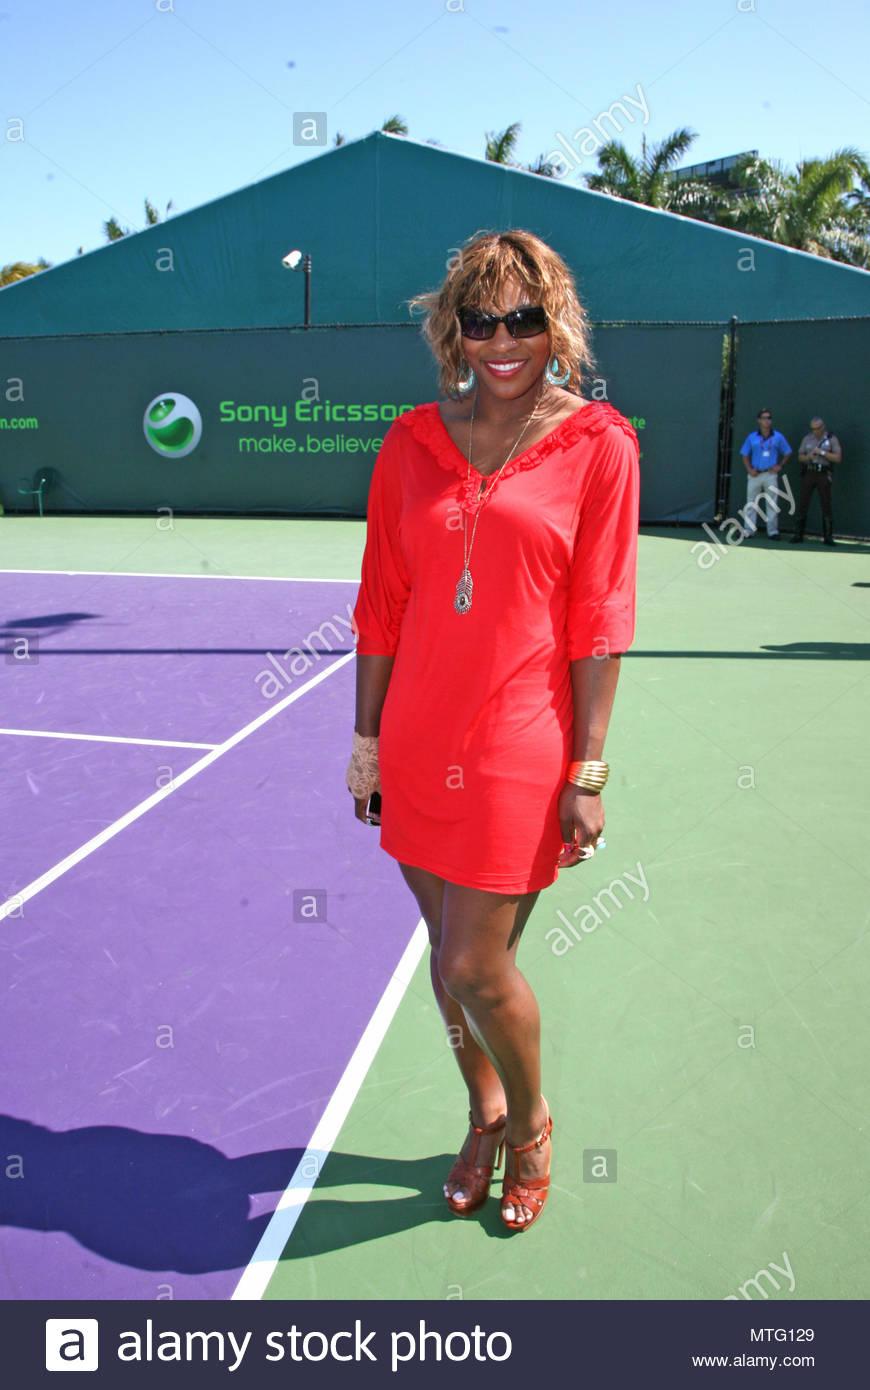 Serena Williams Serena Williams At The Sony Ericsson Open Shows